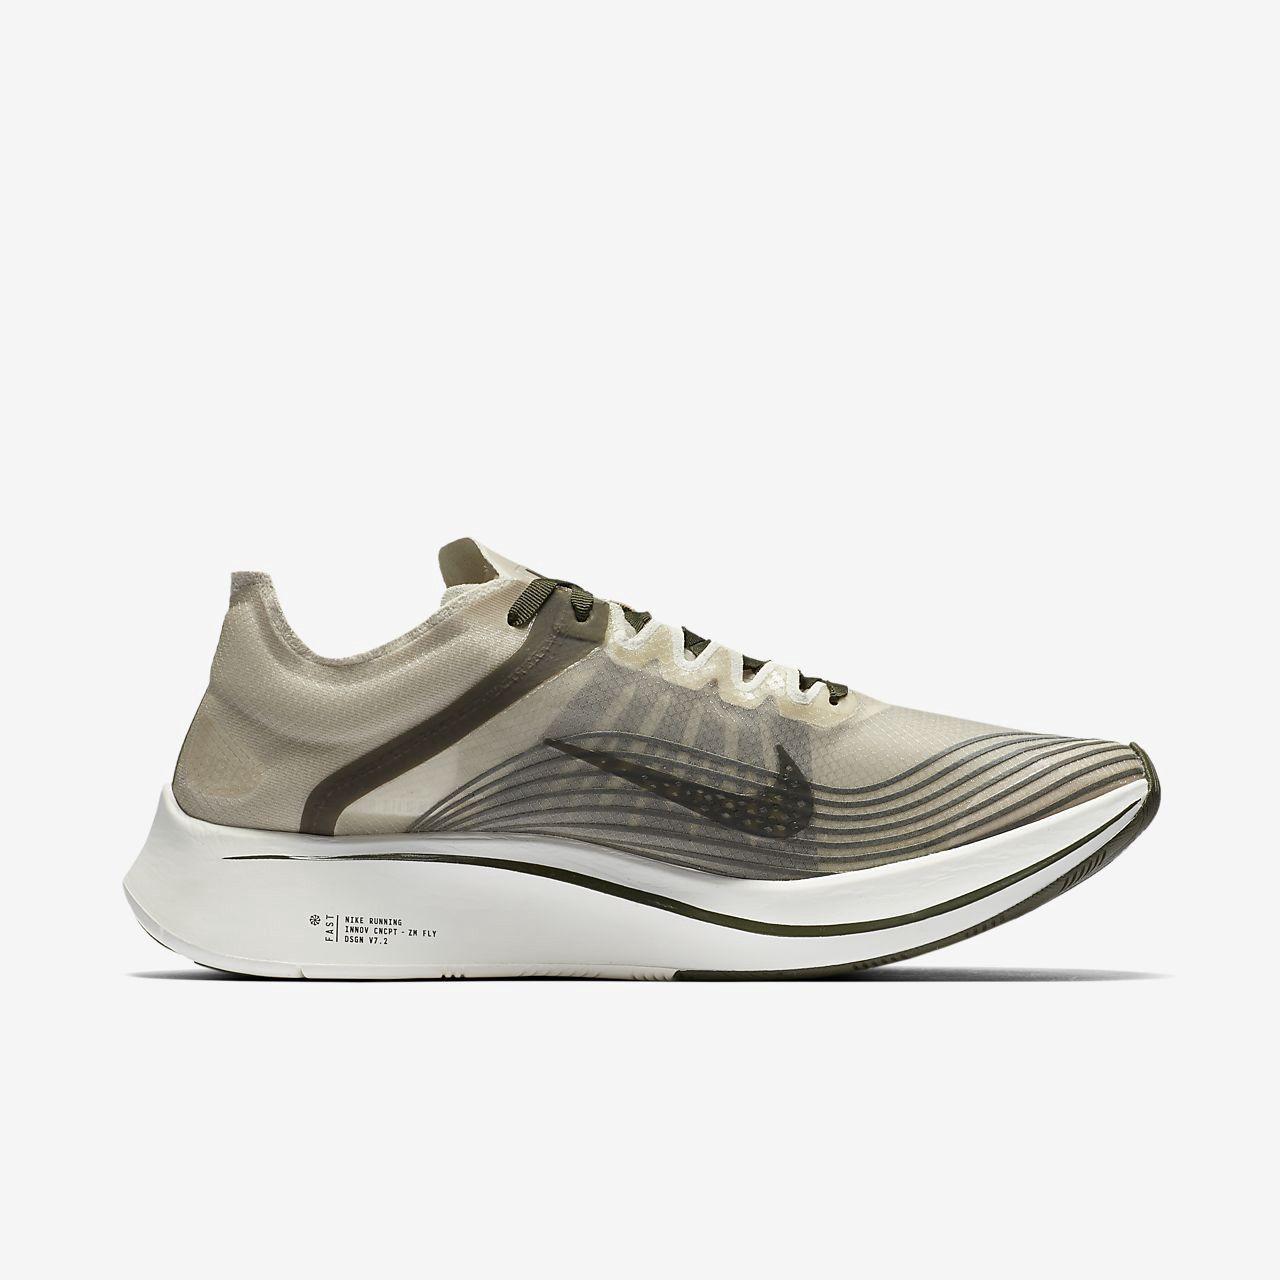 Nike Zoom Fly Sp Unisex Running Shoe M 4 / W 5.5